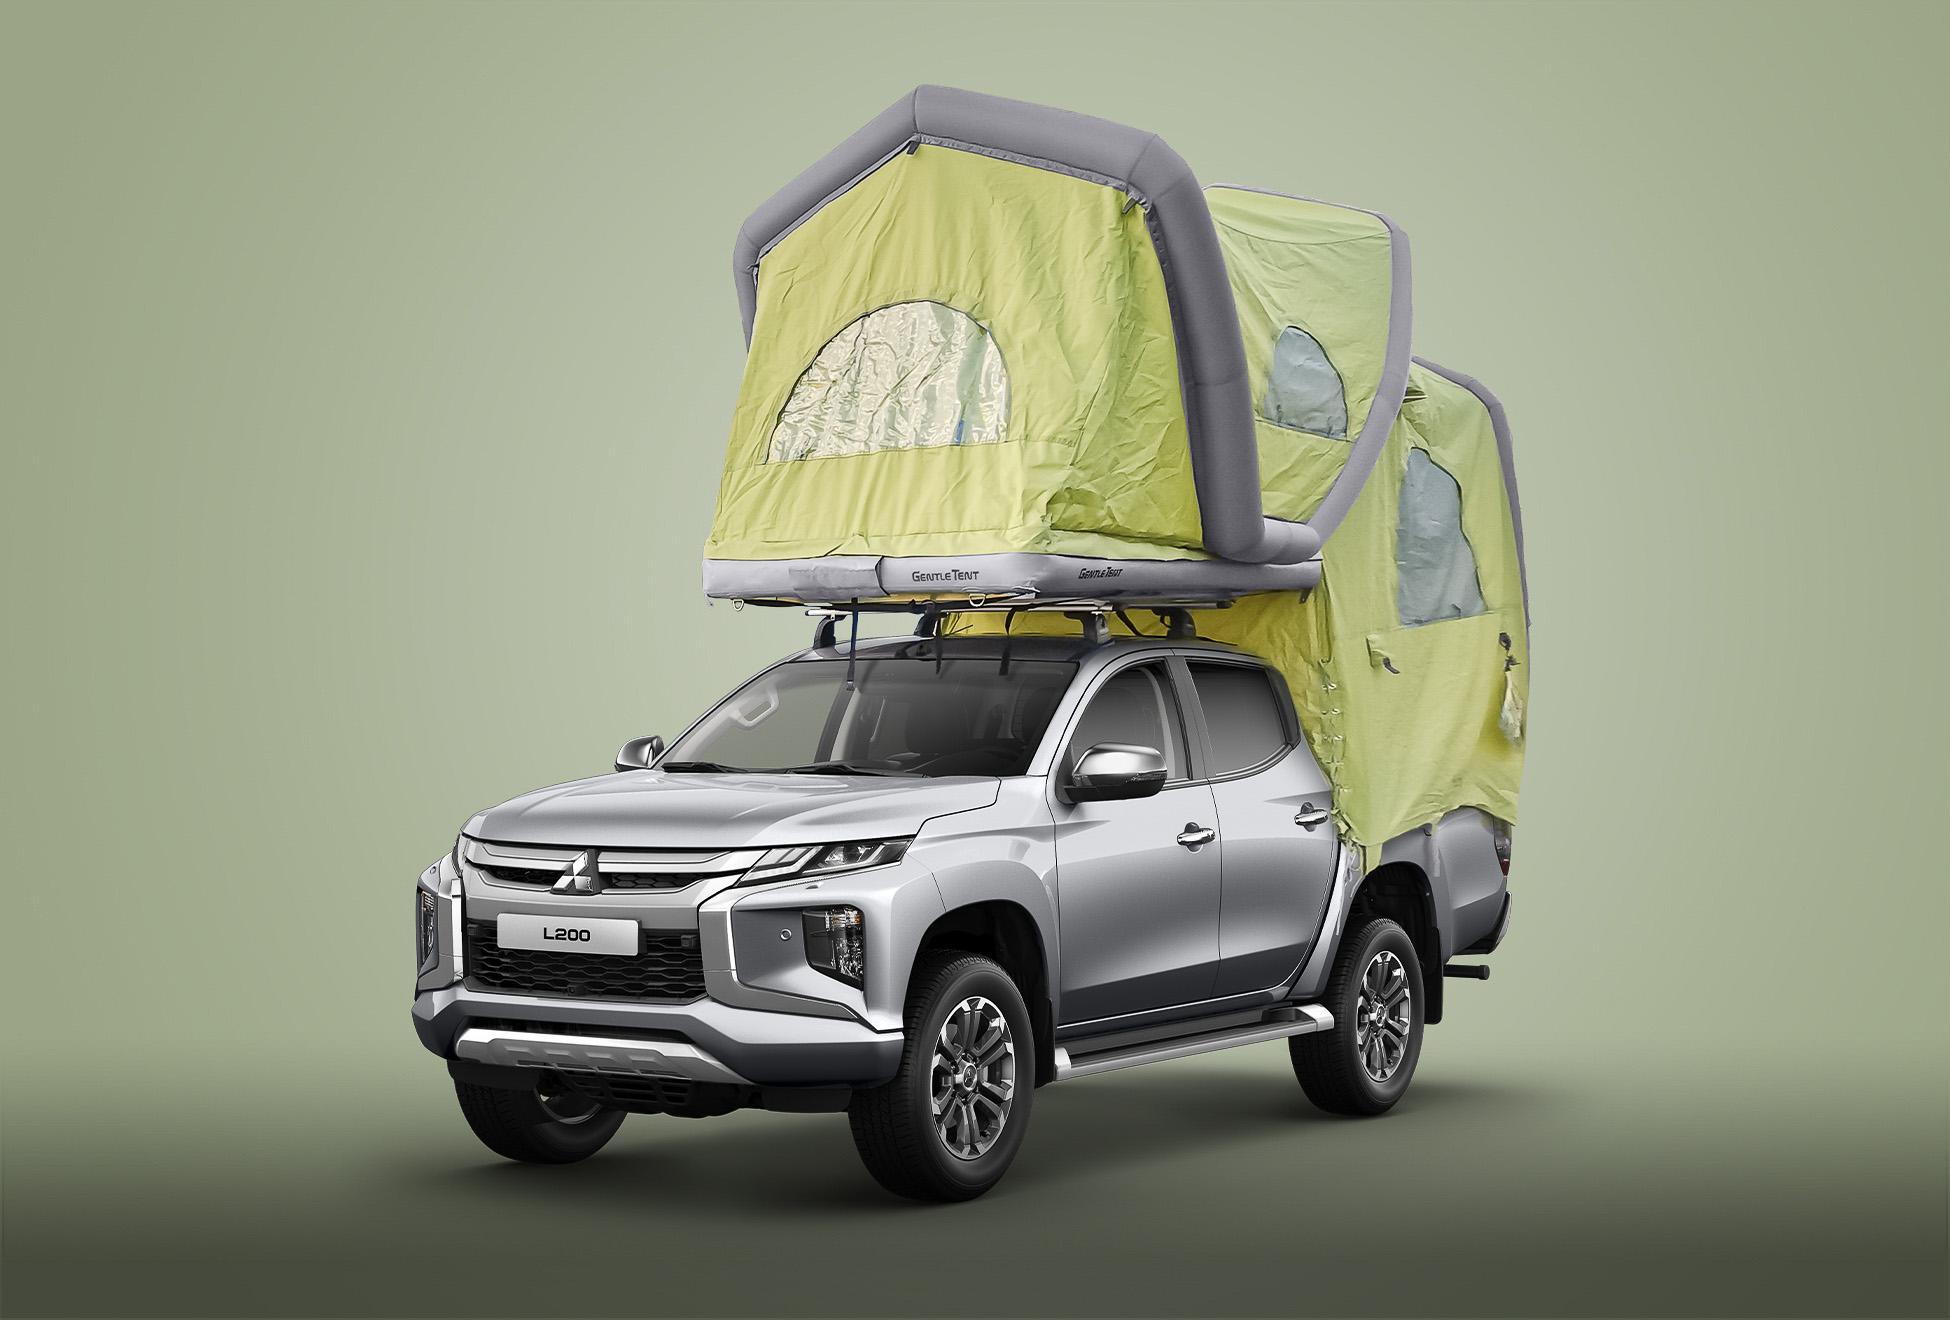 2020 Mitsubishi L200 GT-Pick Up Dachzelt   Fanaticar Magazin